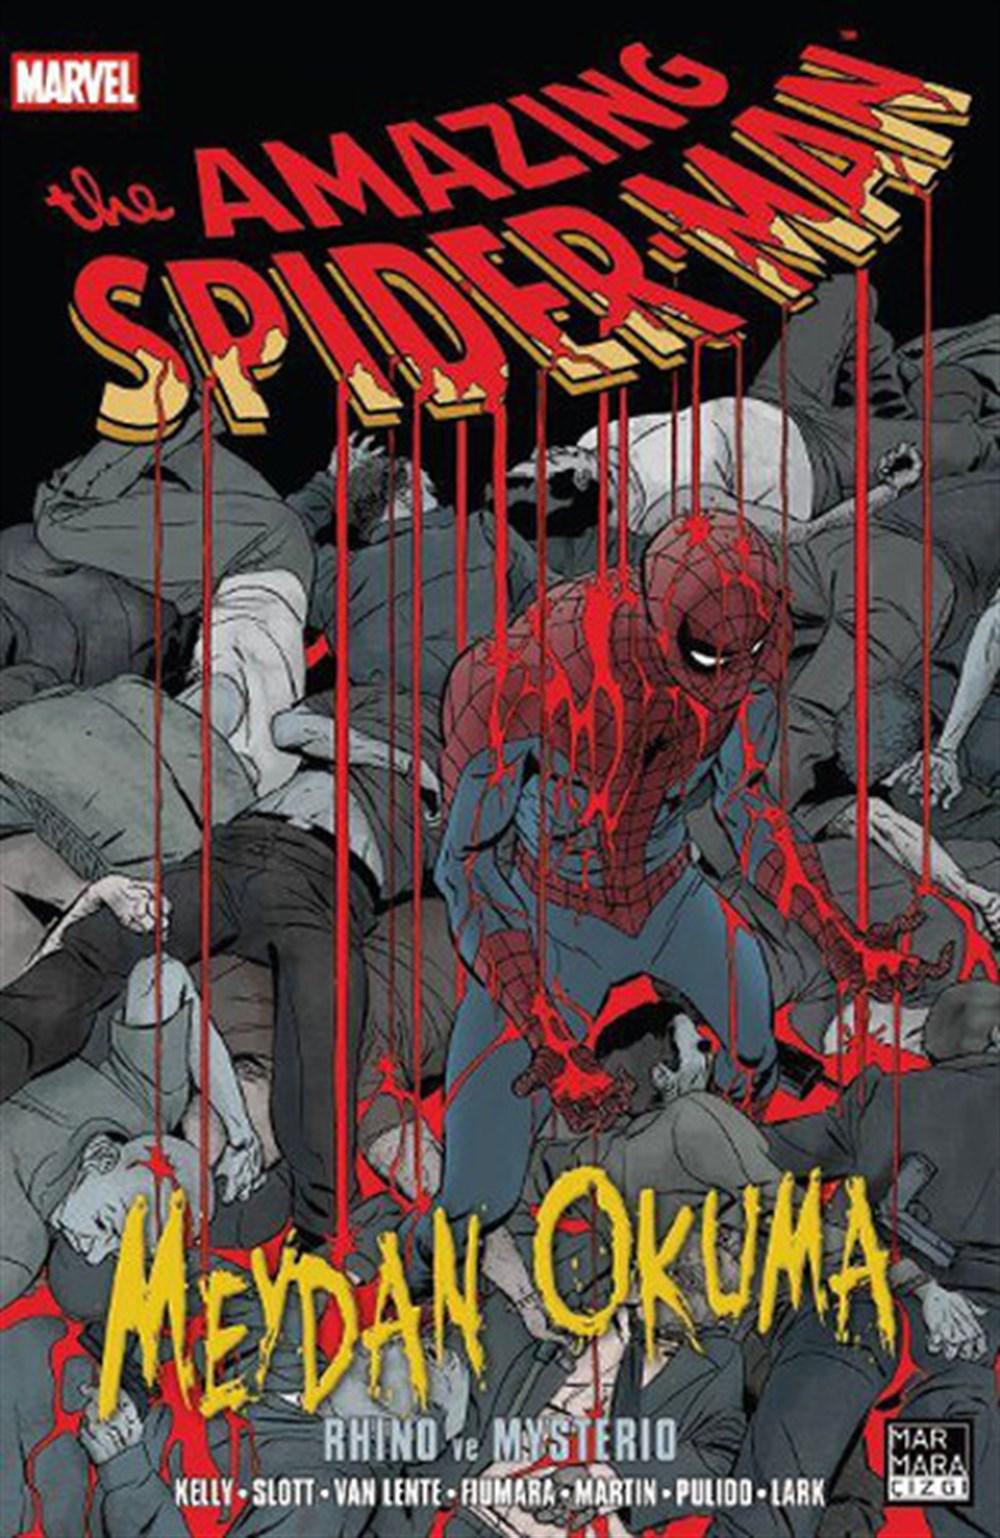 The Amazing Spider-Man Cilt 15: Meydan Okuma Cilt 2:  - Rhino ve Mastrerio